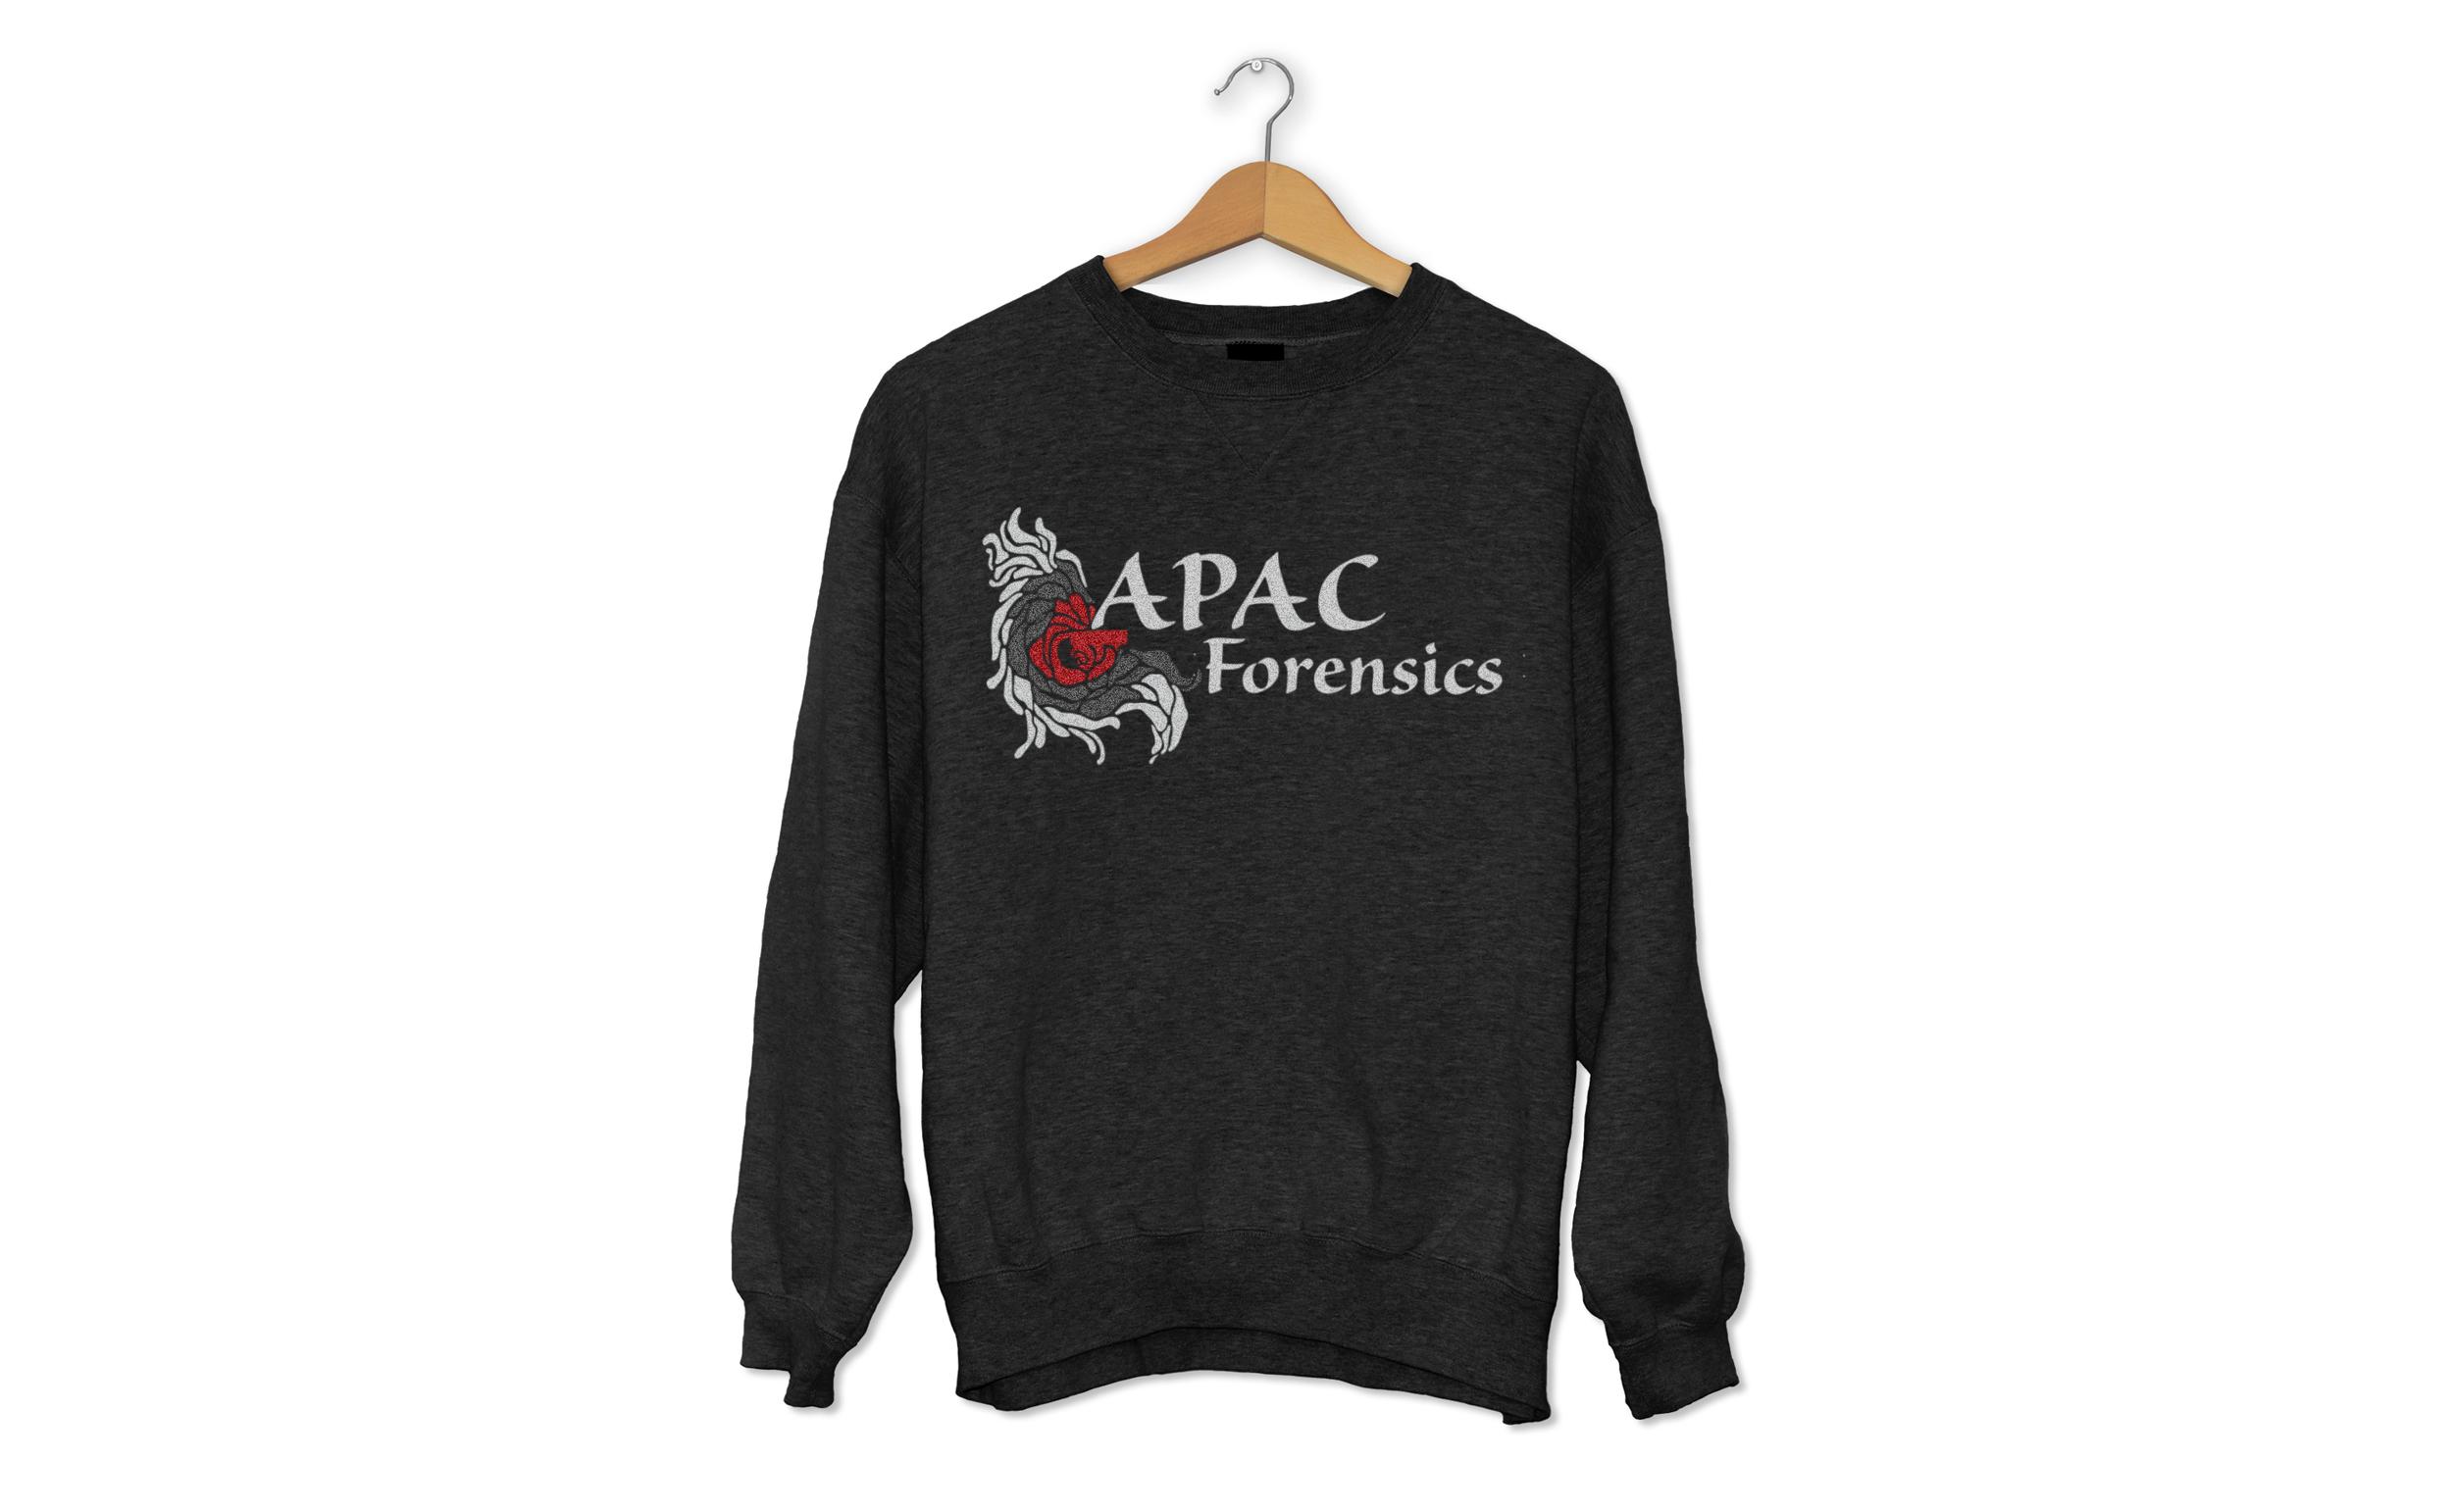 APAC Forensics Front Shirt Design